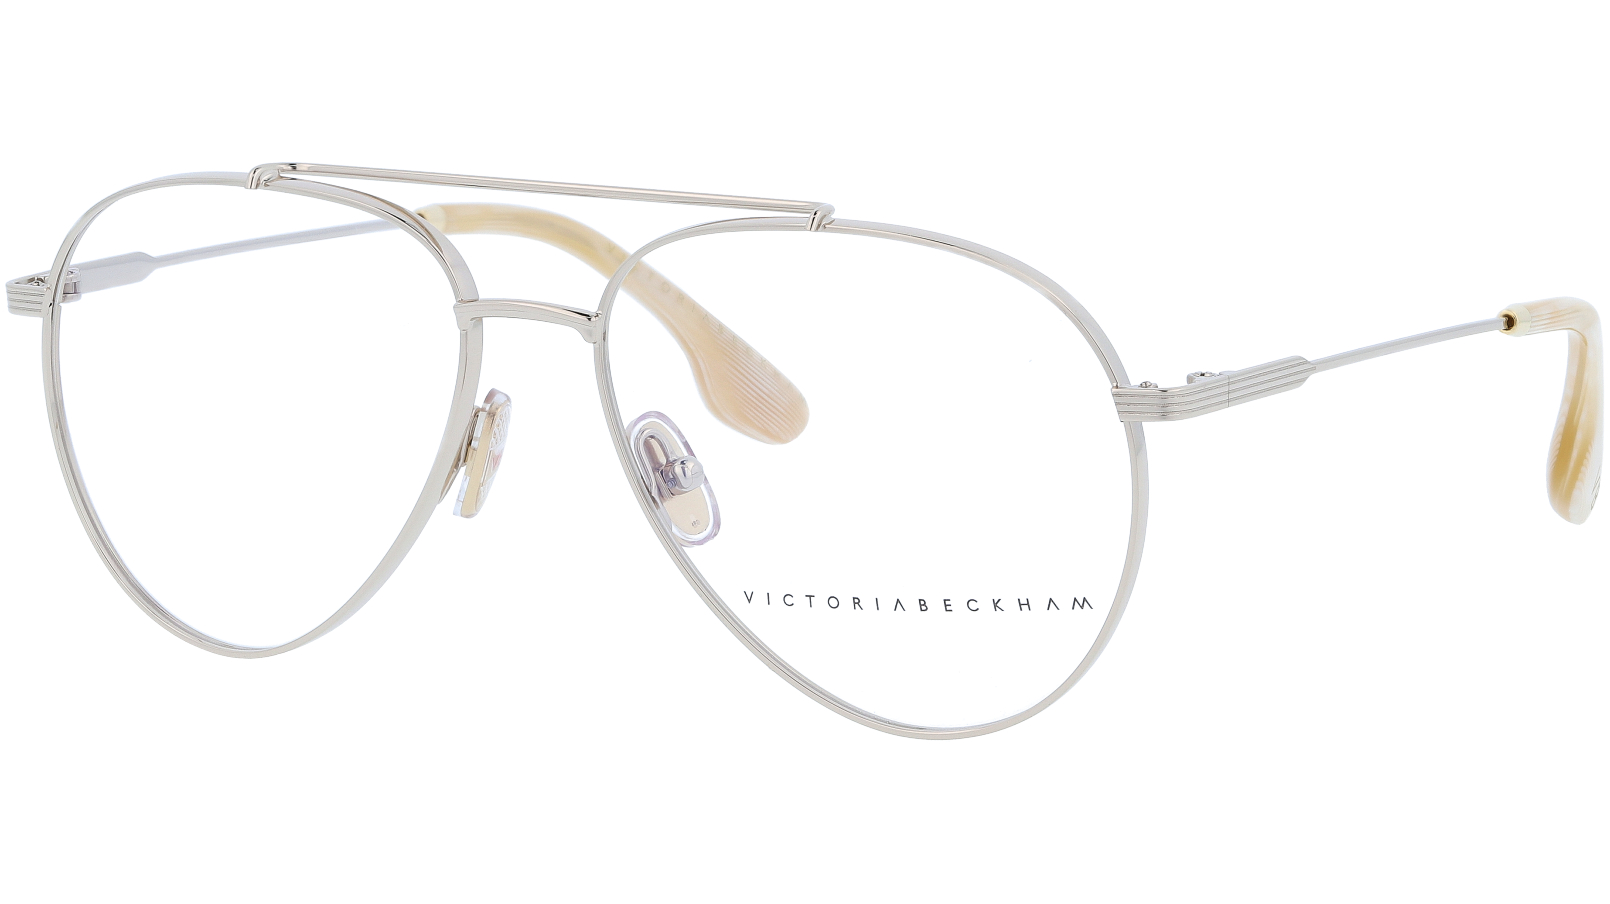 VICTORIA BECKHAM VB218 715 56 LIGHT Glasses